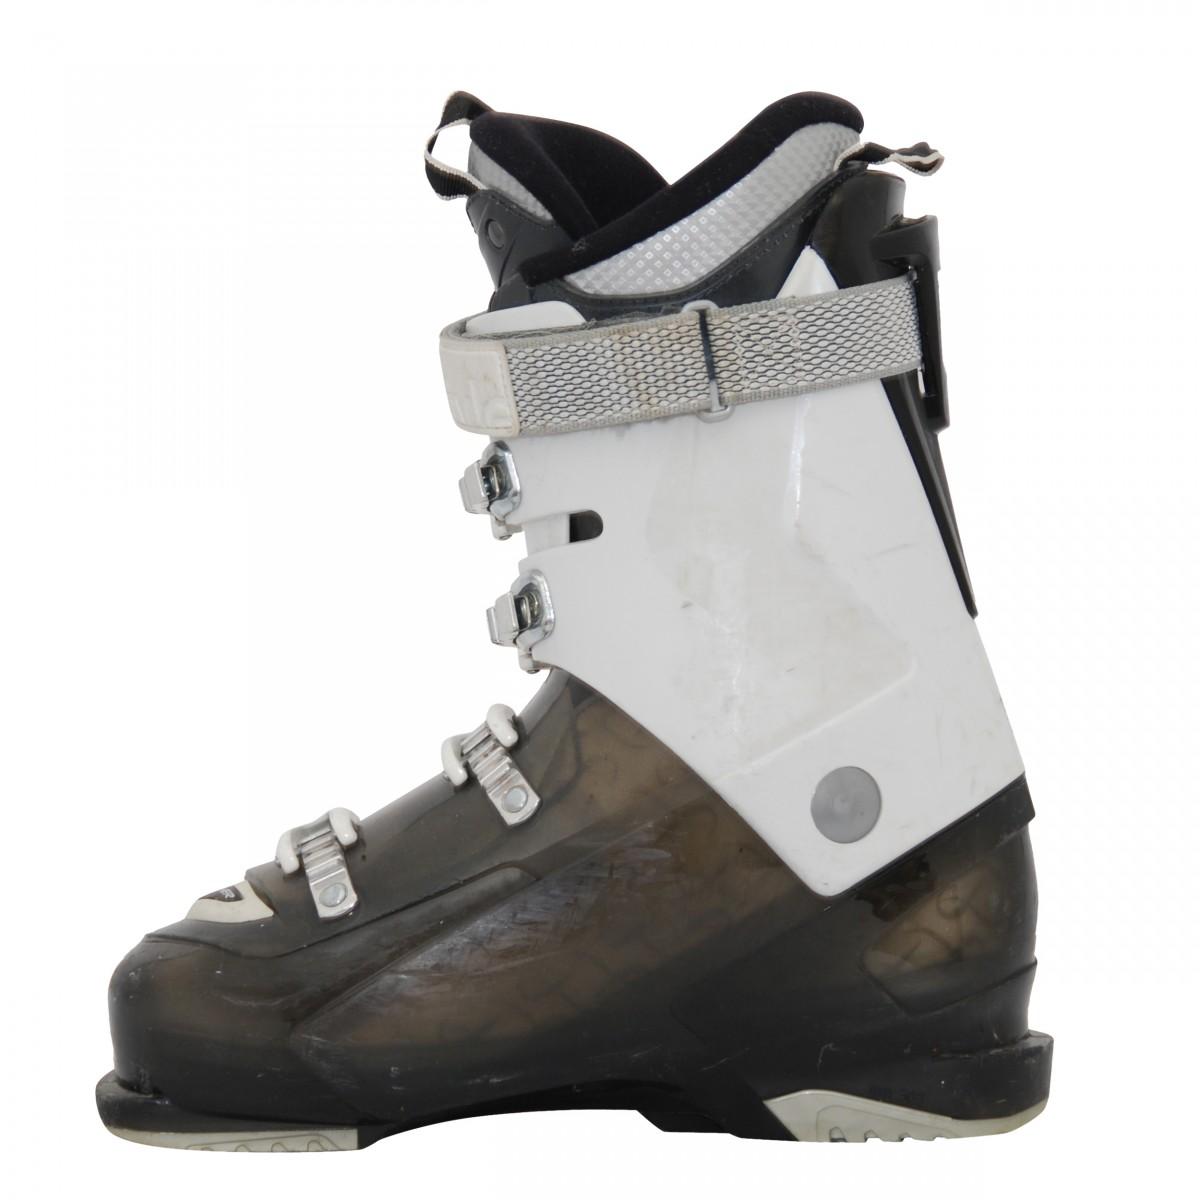 Chaussure de ski occasion Fischer xtr 8 my style noir et blanc